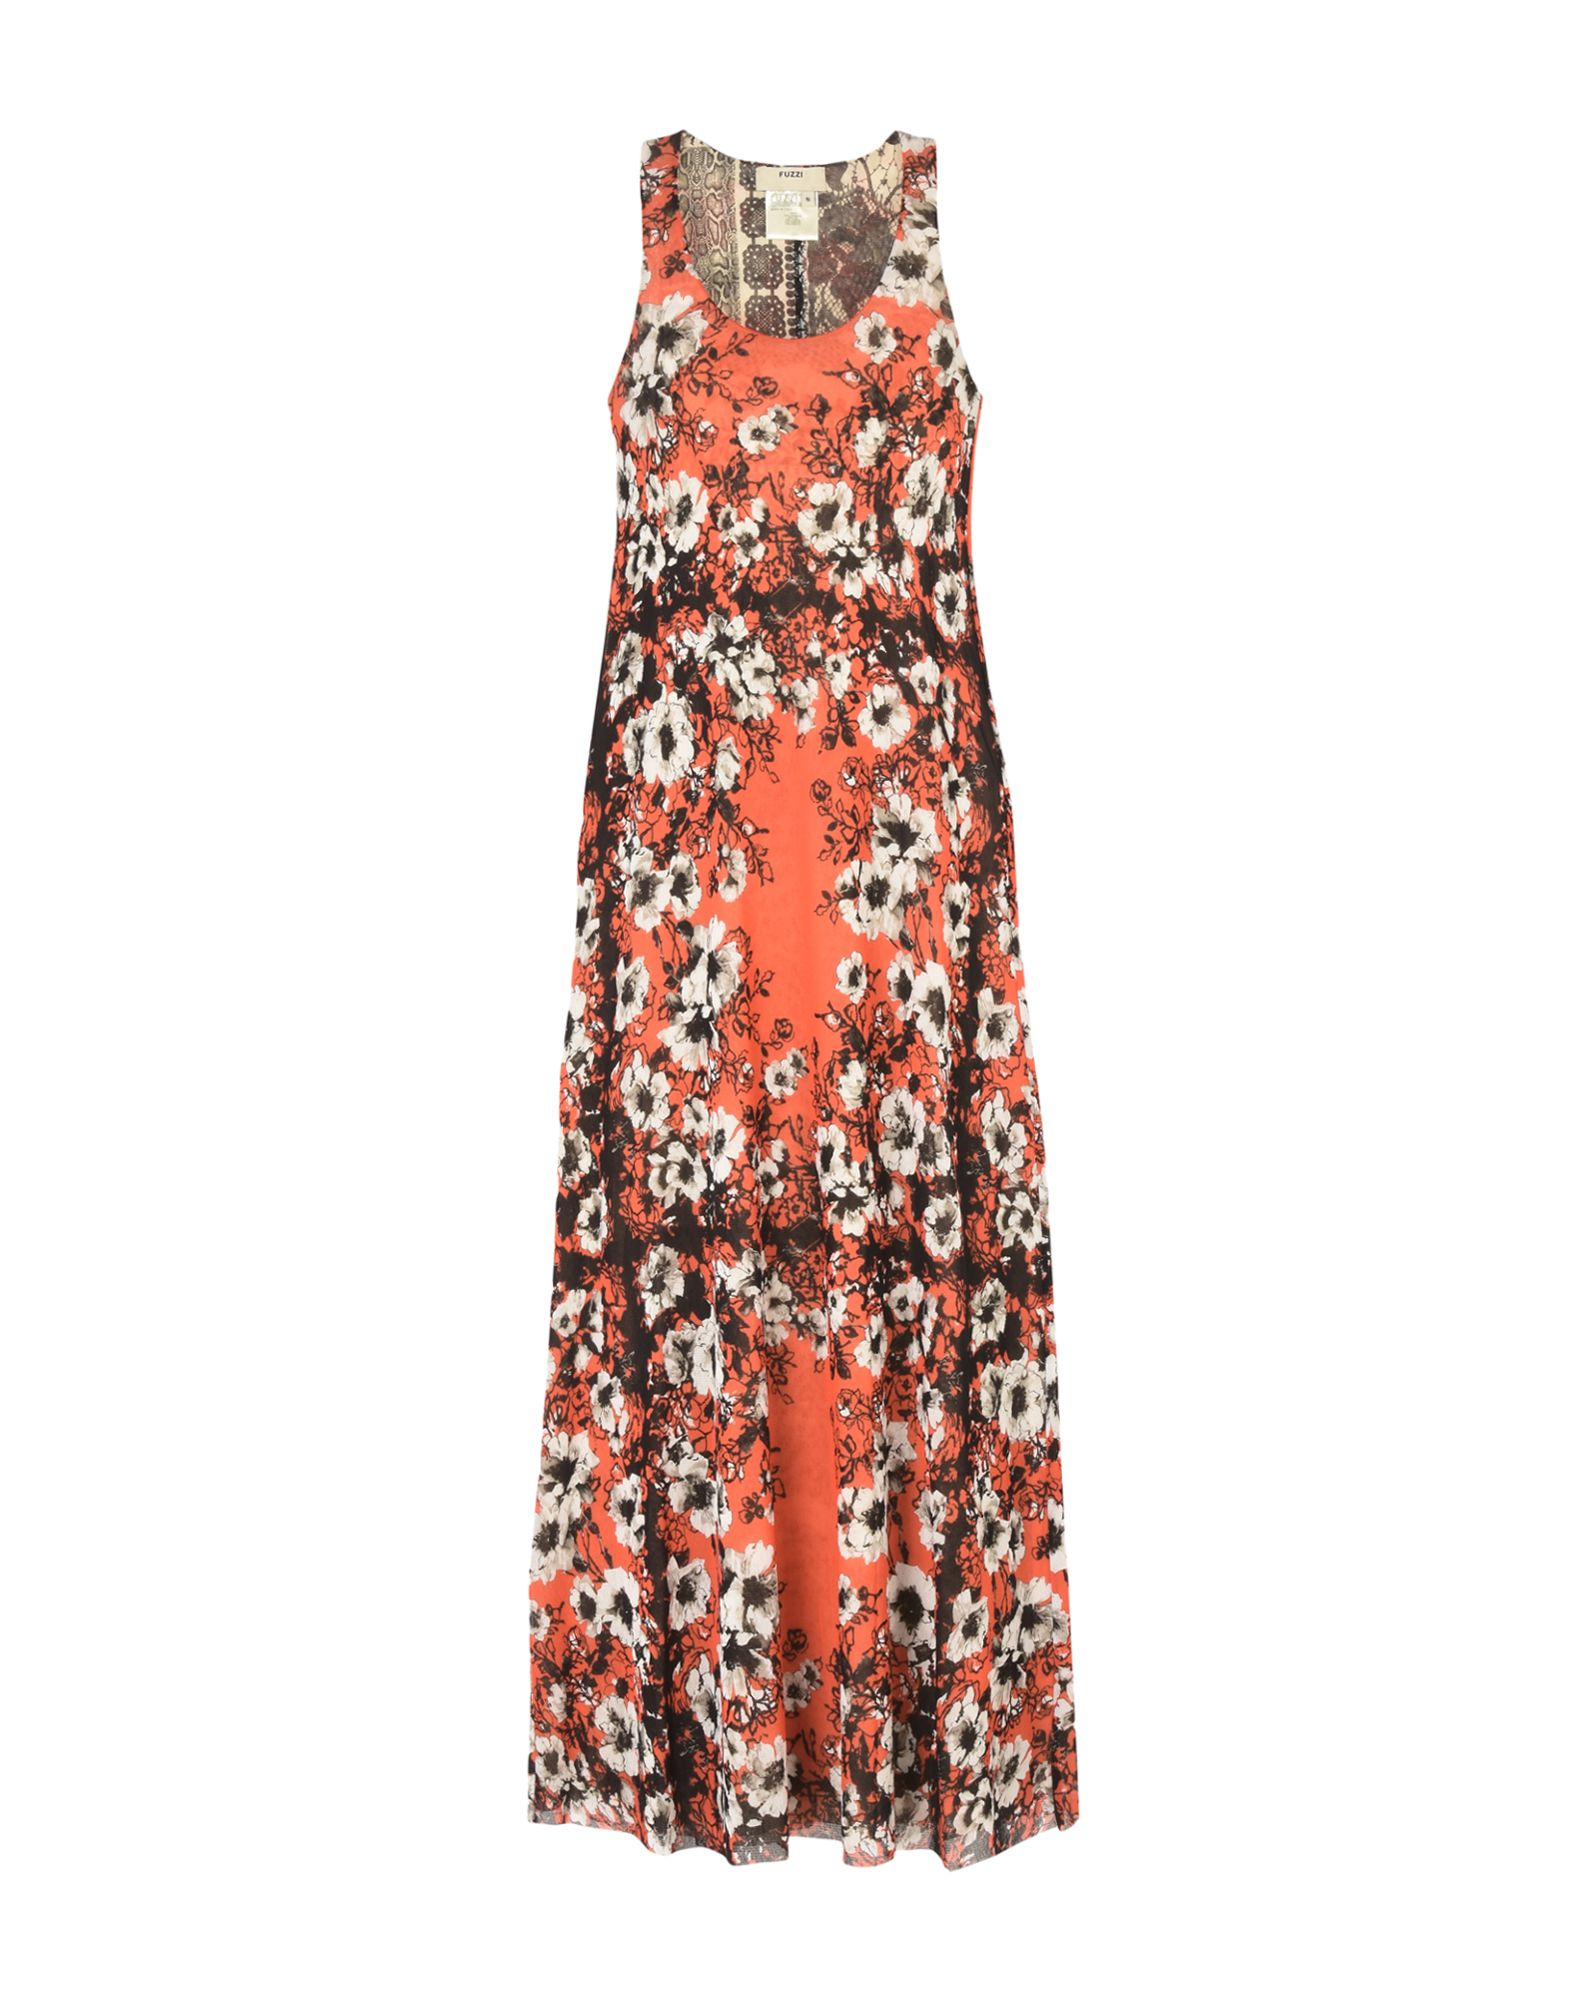 FUZZI Платье длиной 3/4 lisa corti платье длиной 3 4